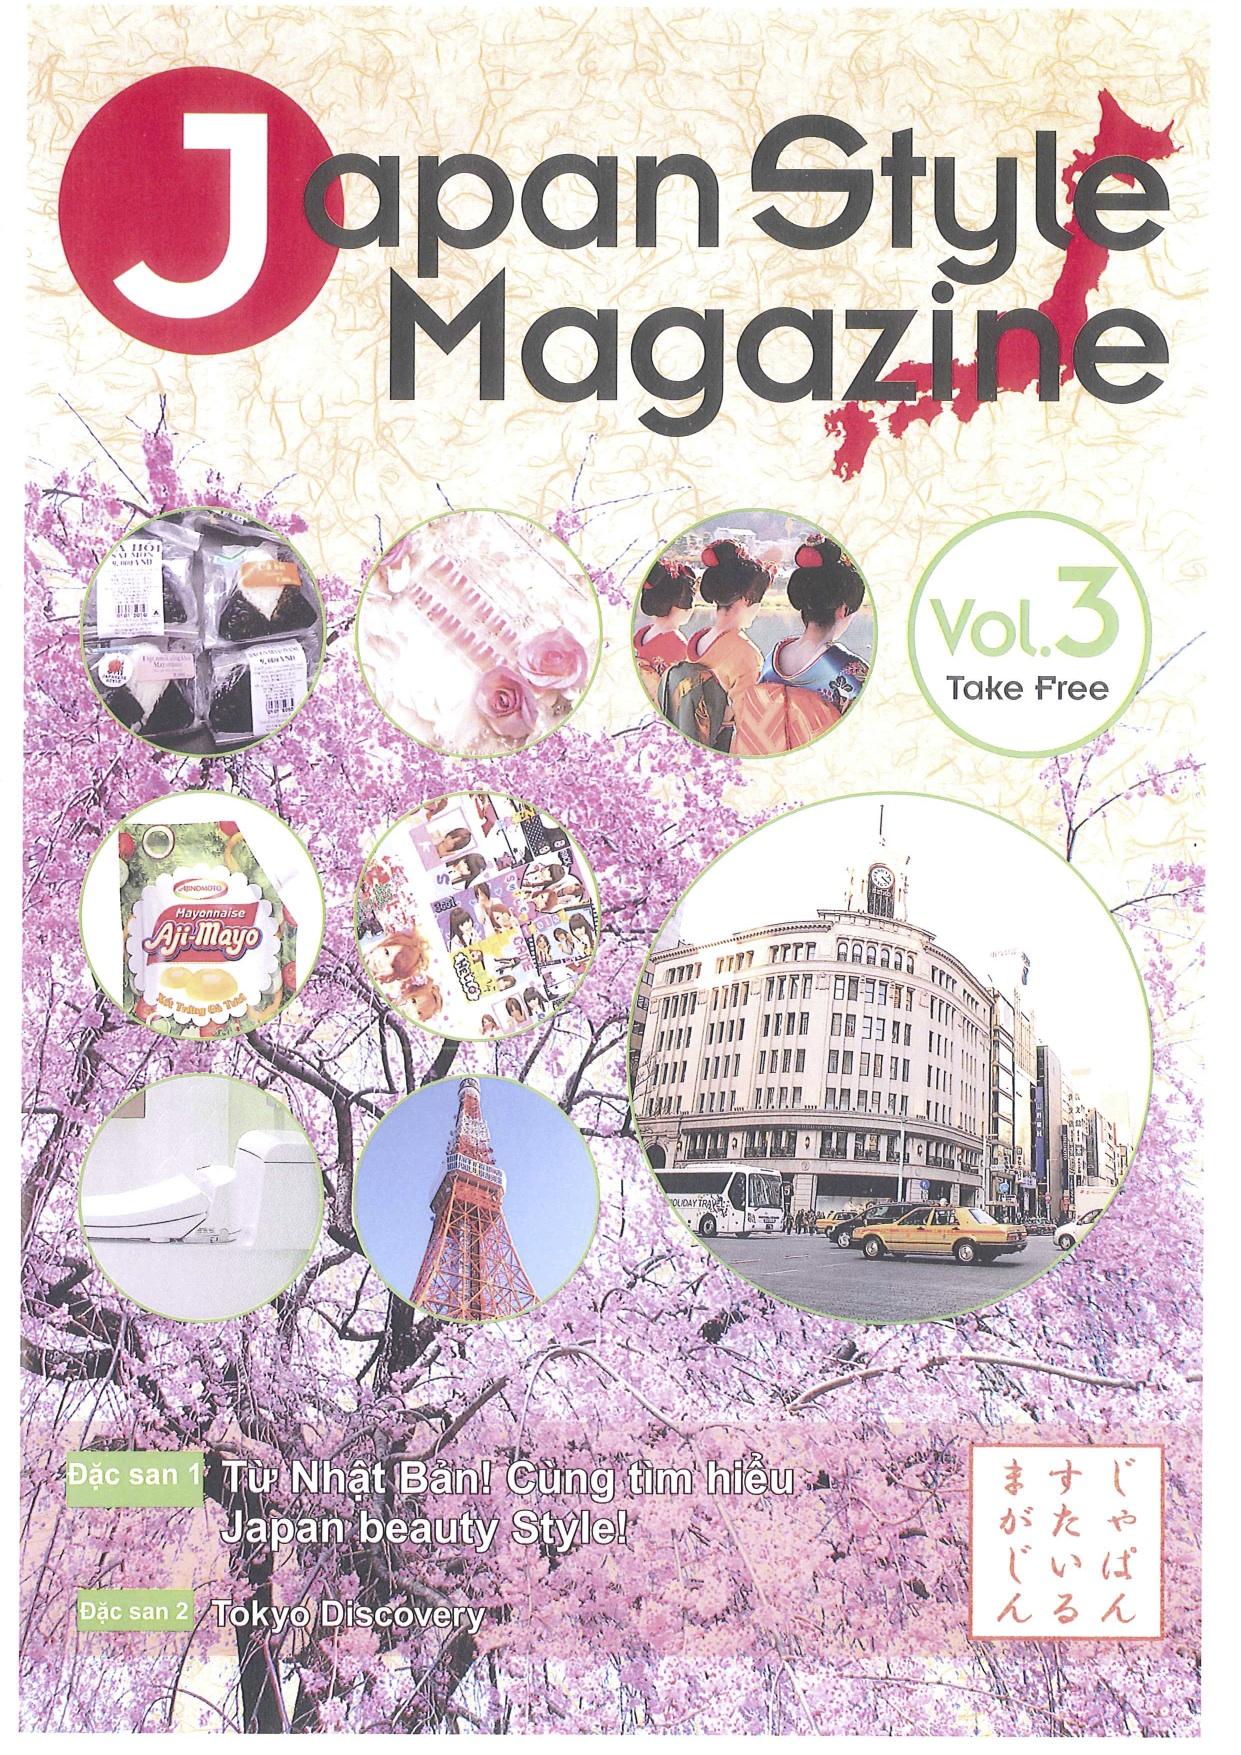 2012 04Japan Style Magazine in Vietnam